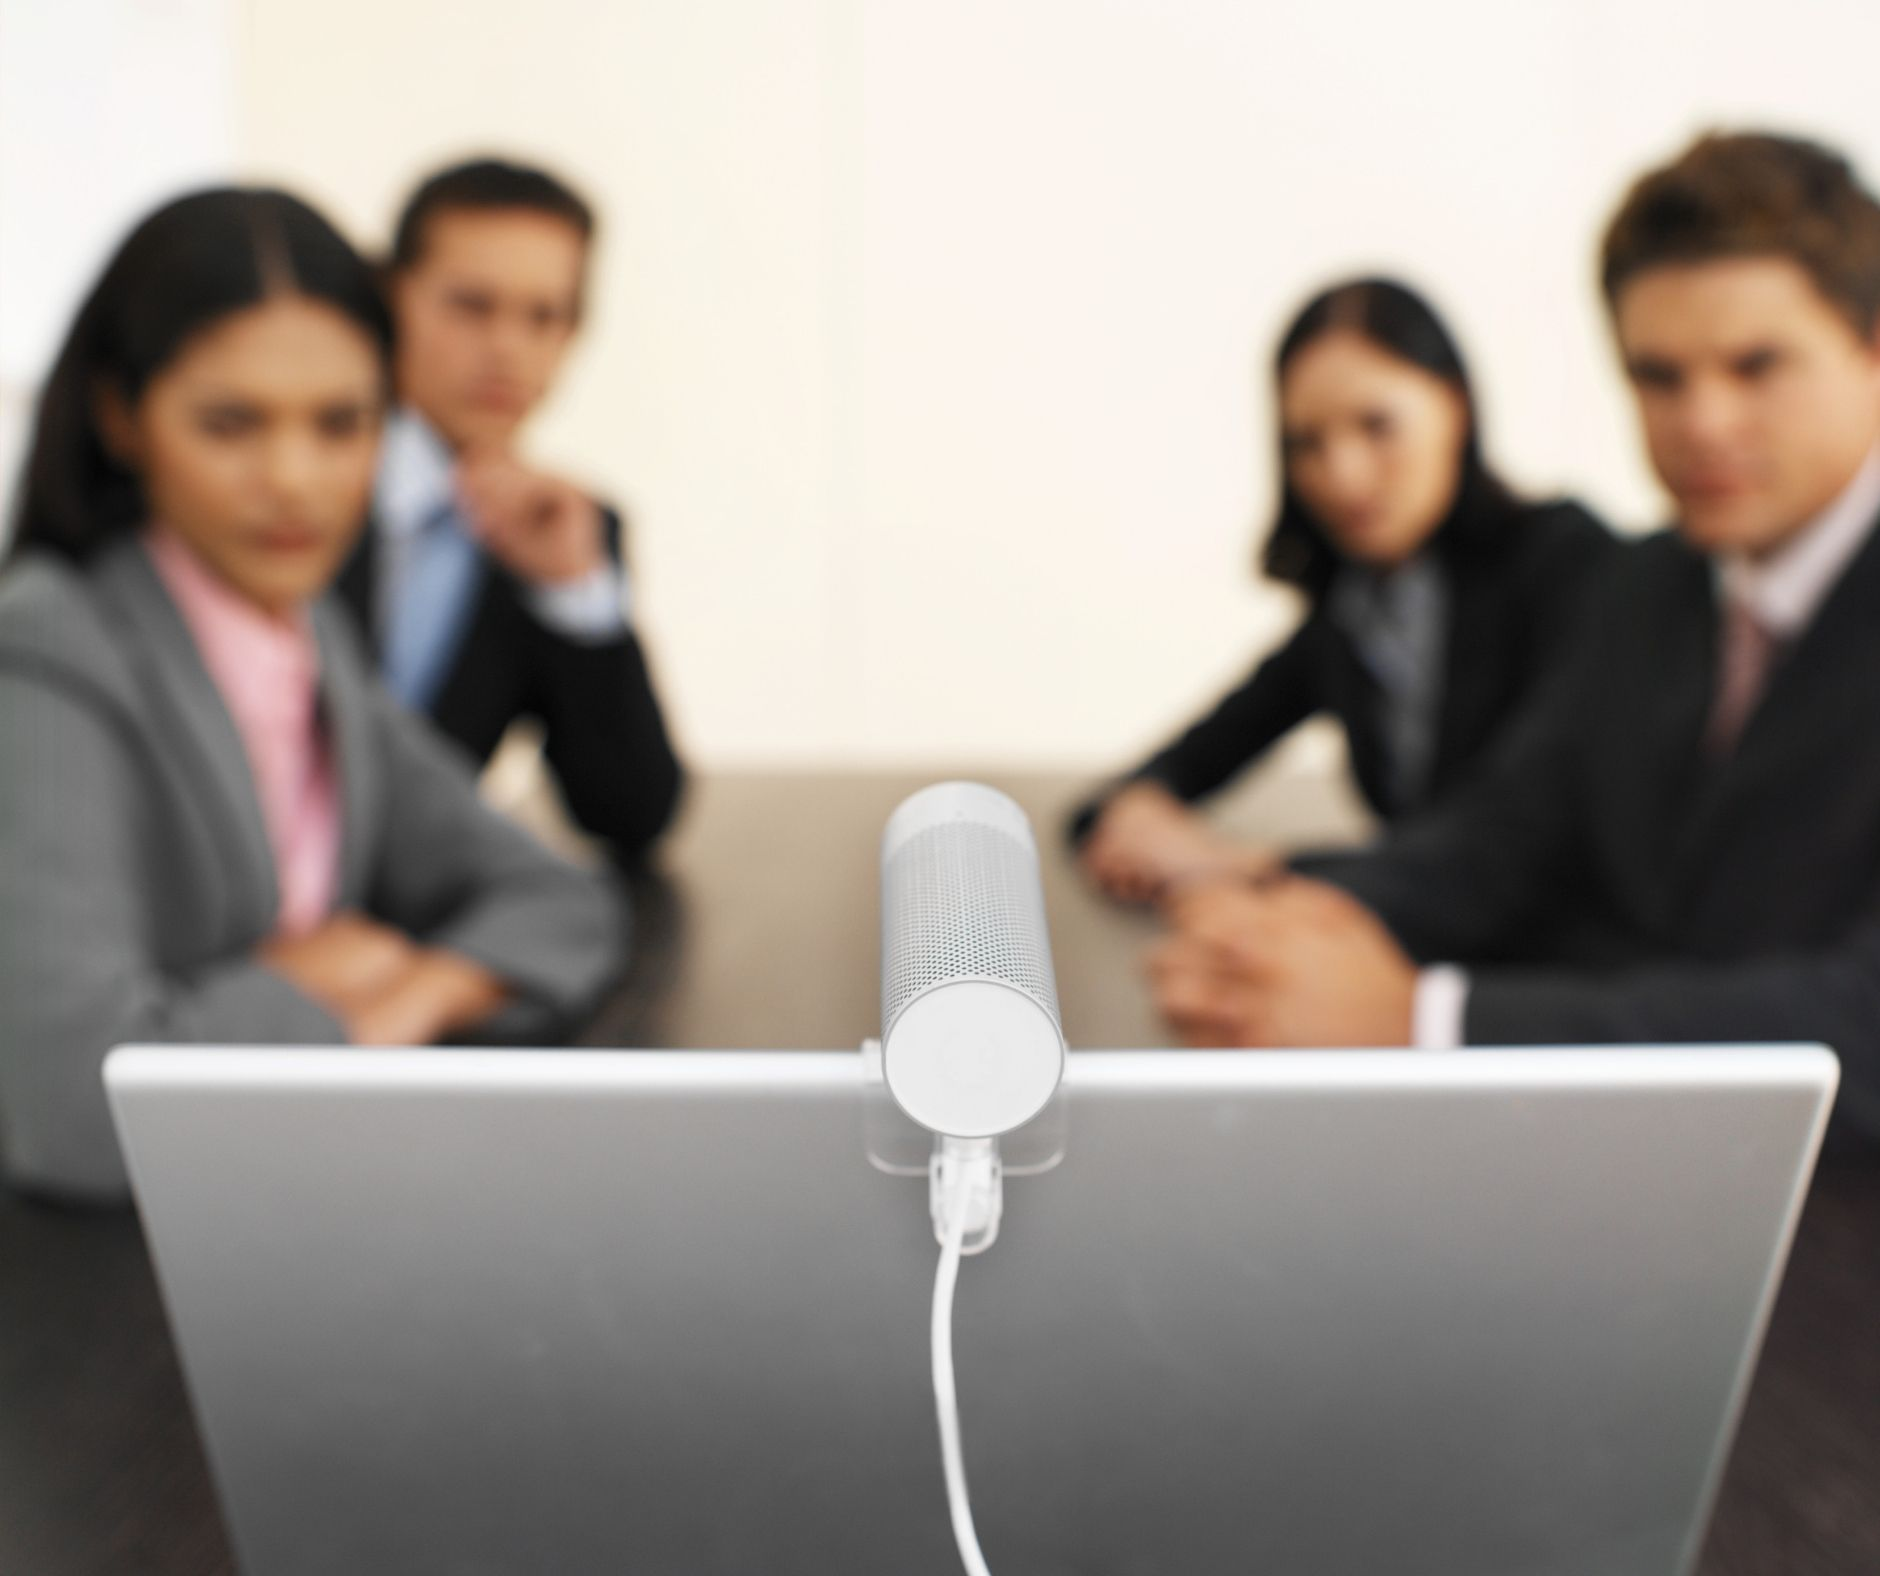 Let's Talk About Remote Mediation